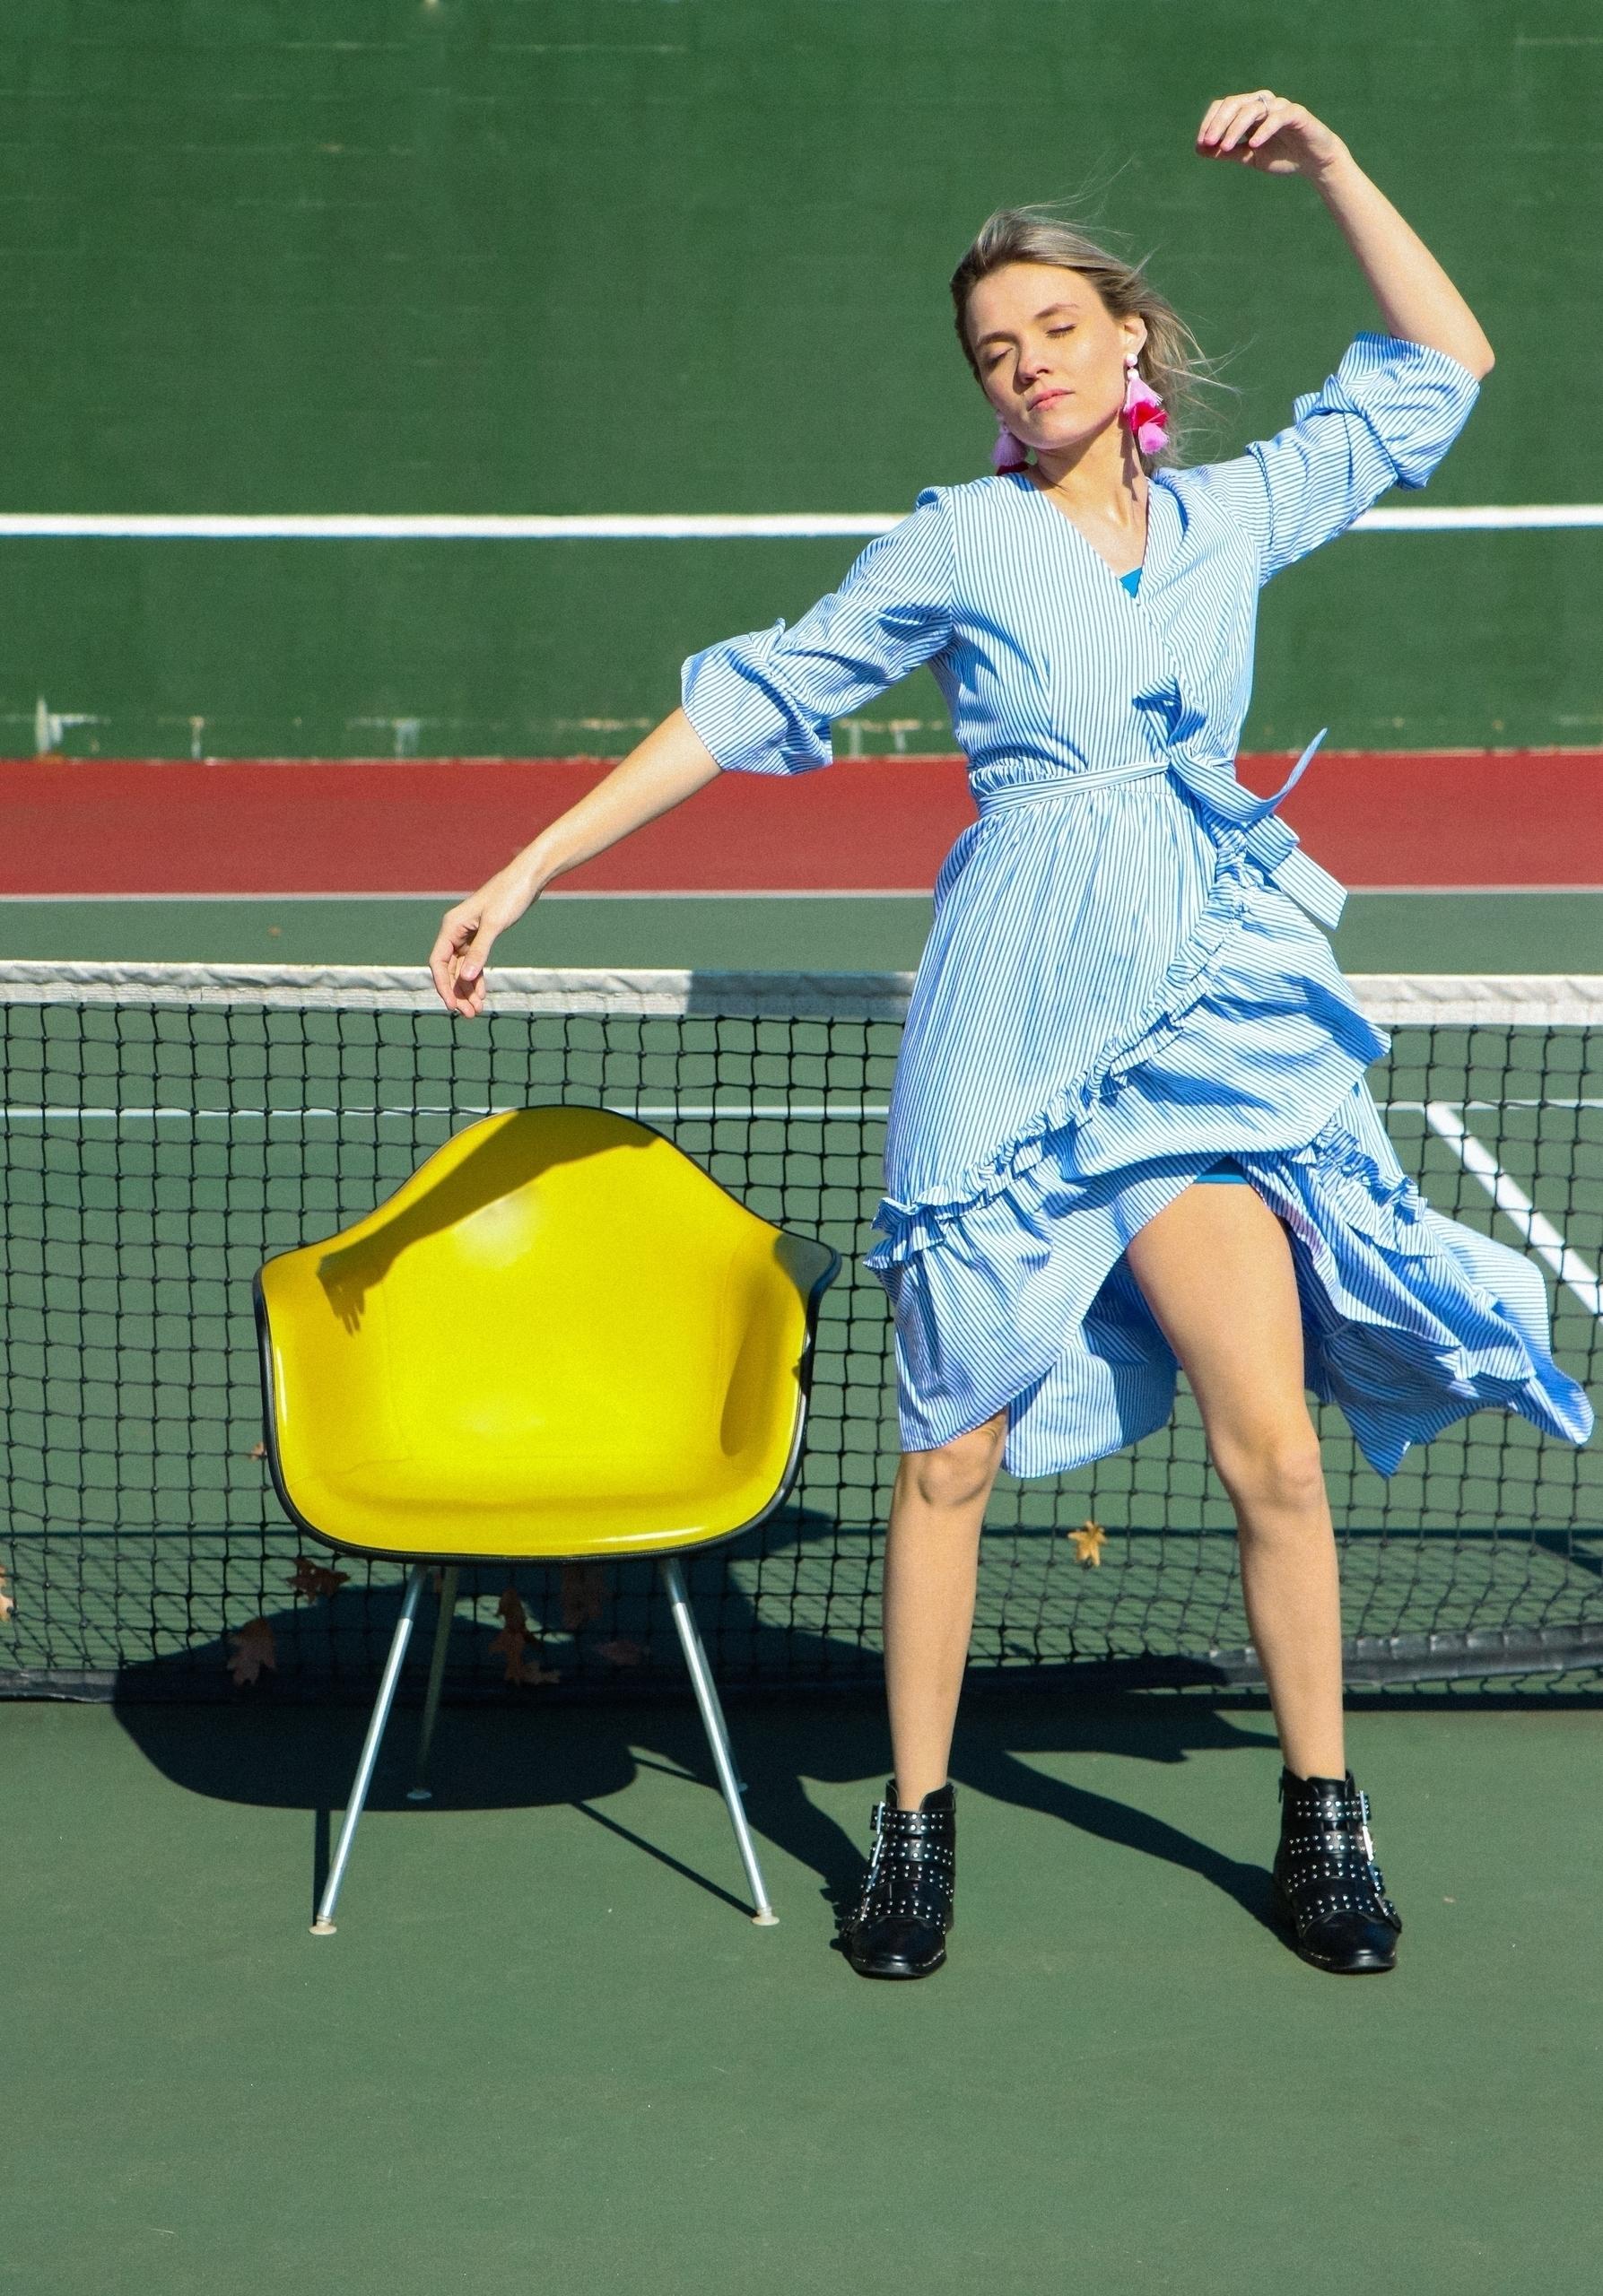 Mod Space Tennis Photographer S - saisiesam | ello